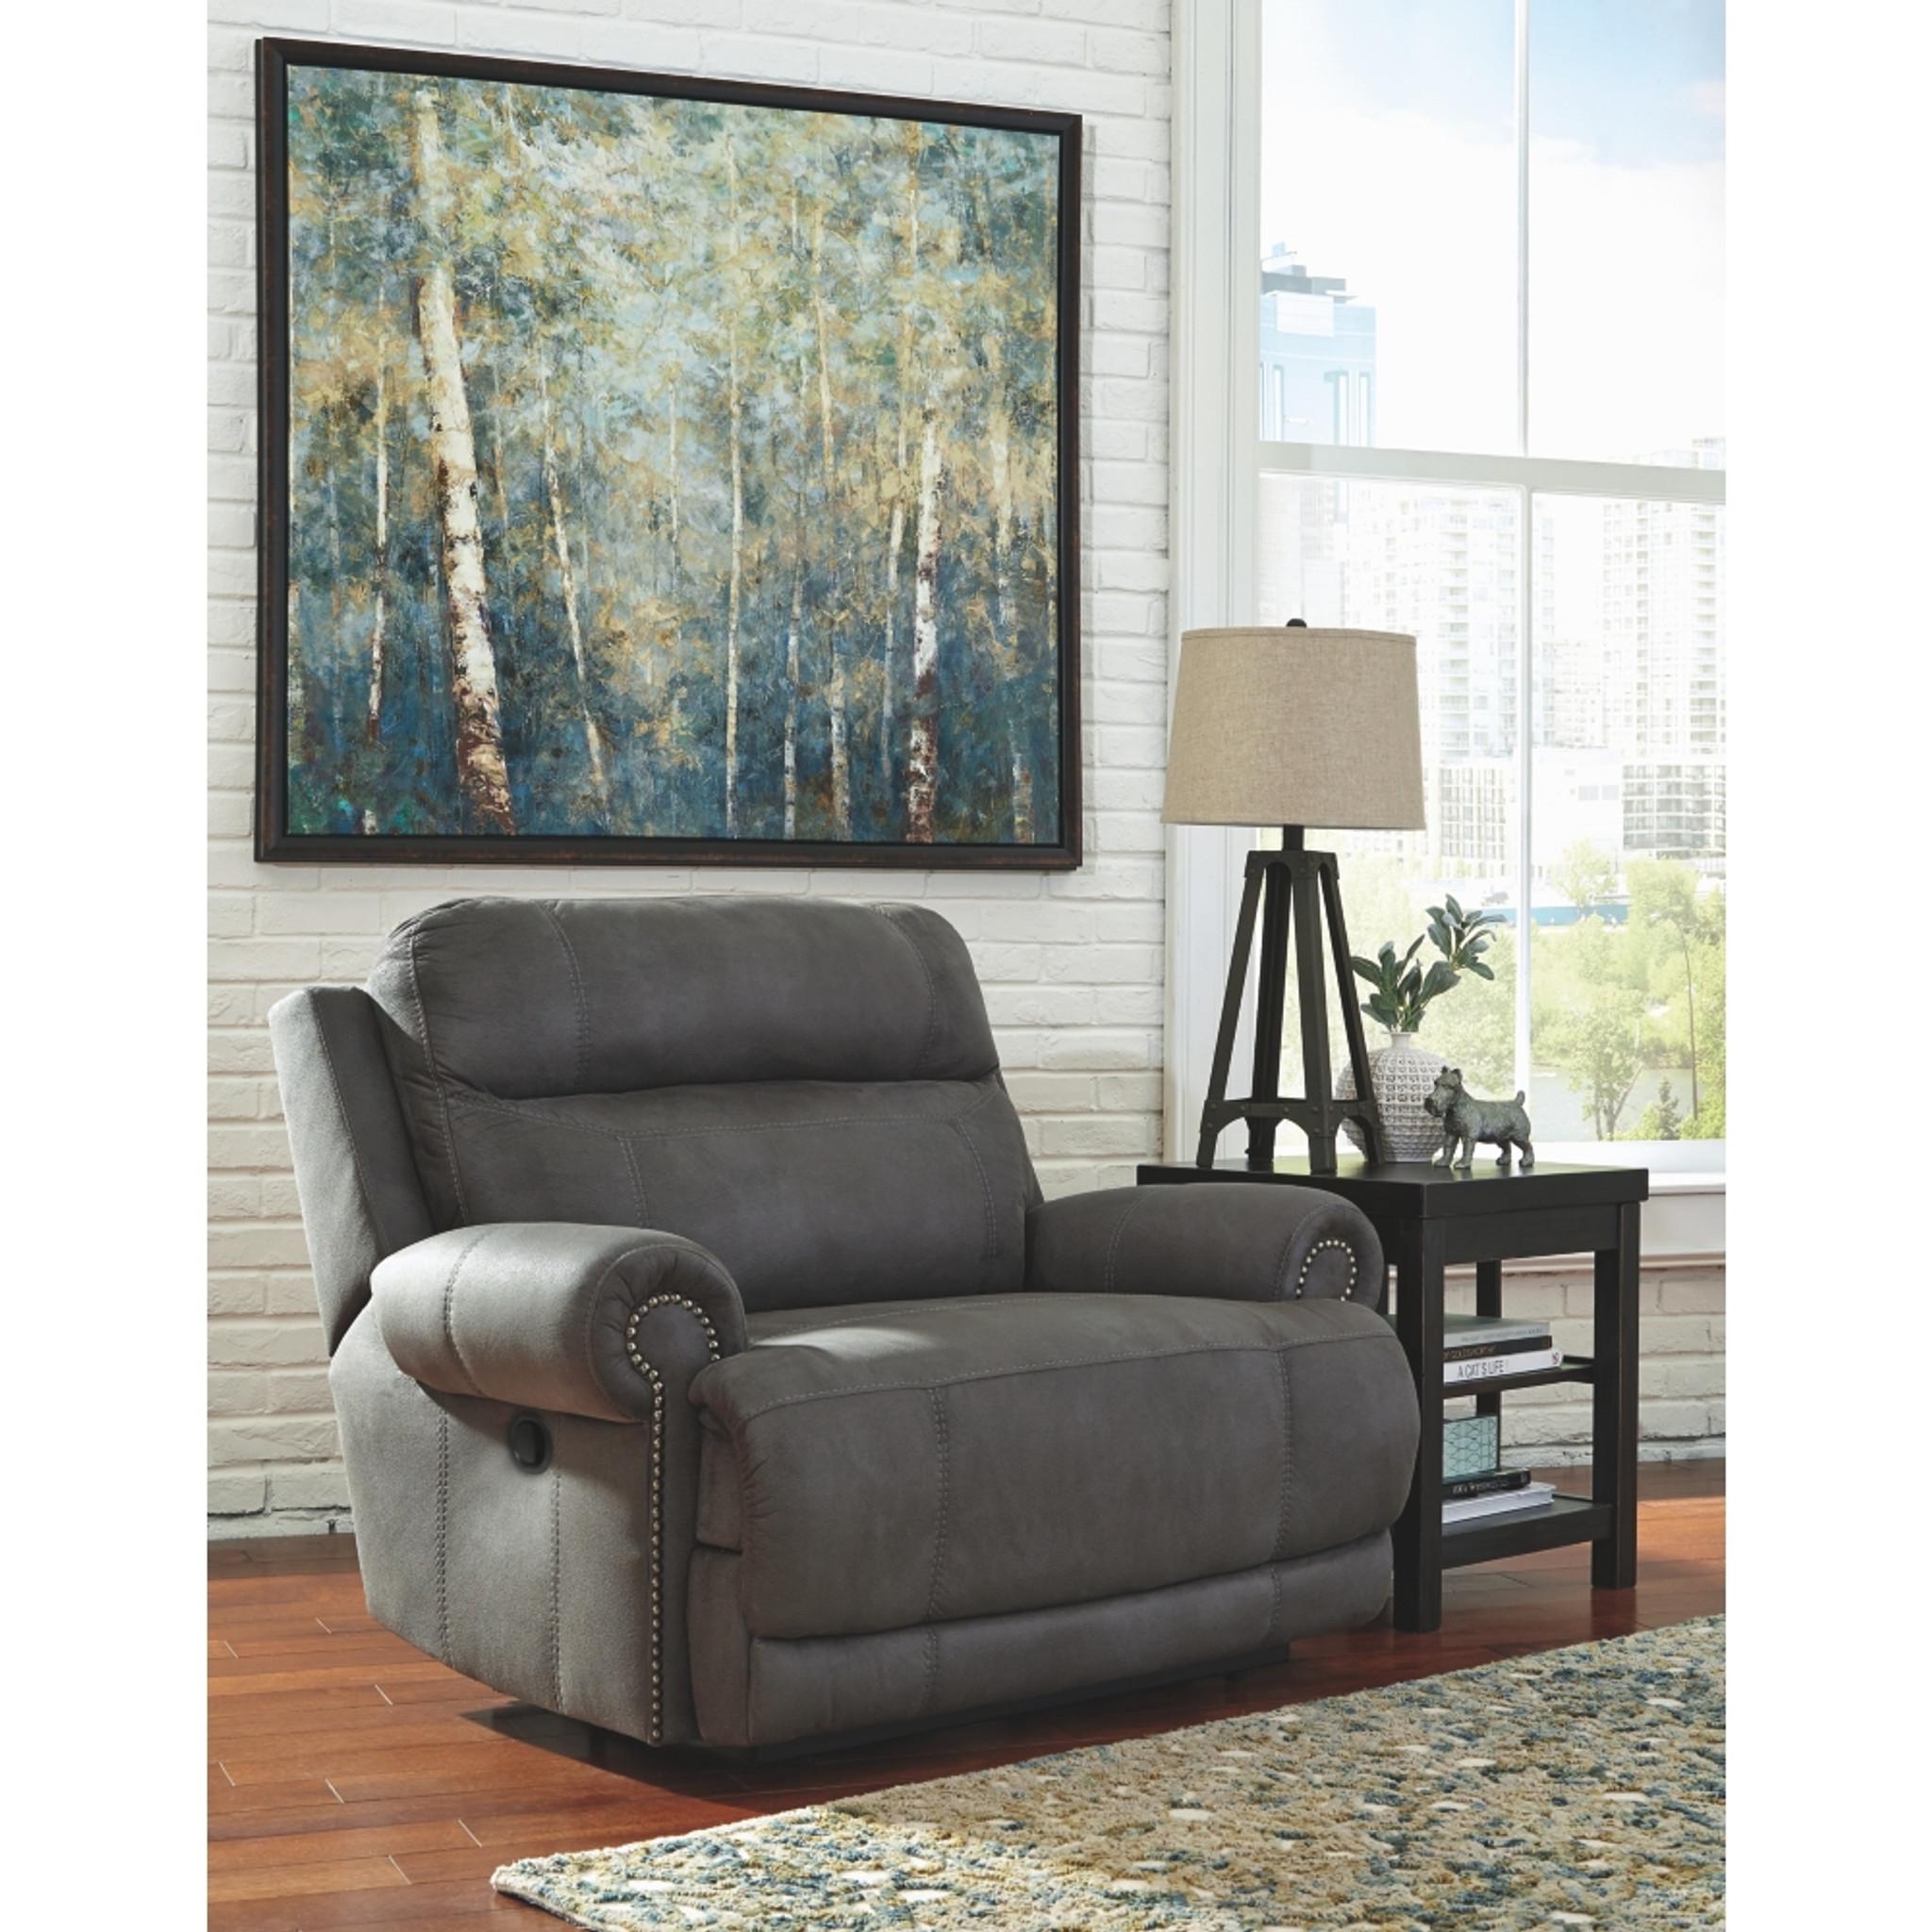 Amazing Austere Gray Wide Seat Recliner Spiritservingveterans Wood Chair Design Ideas Spiritservingveteransorg